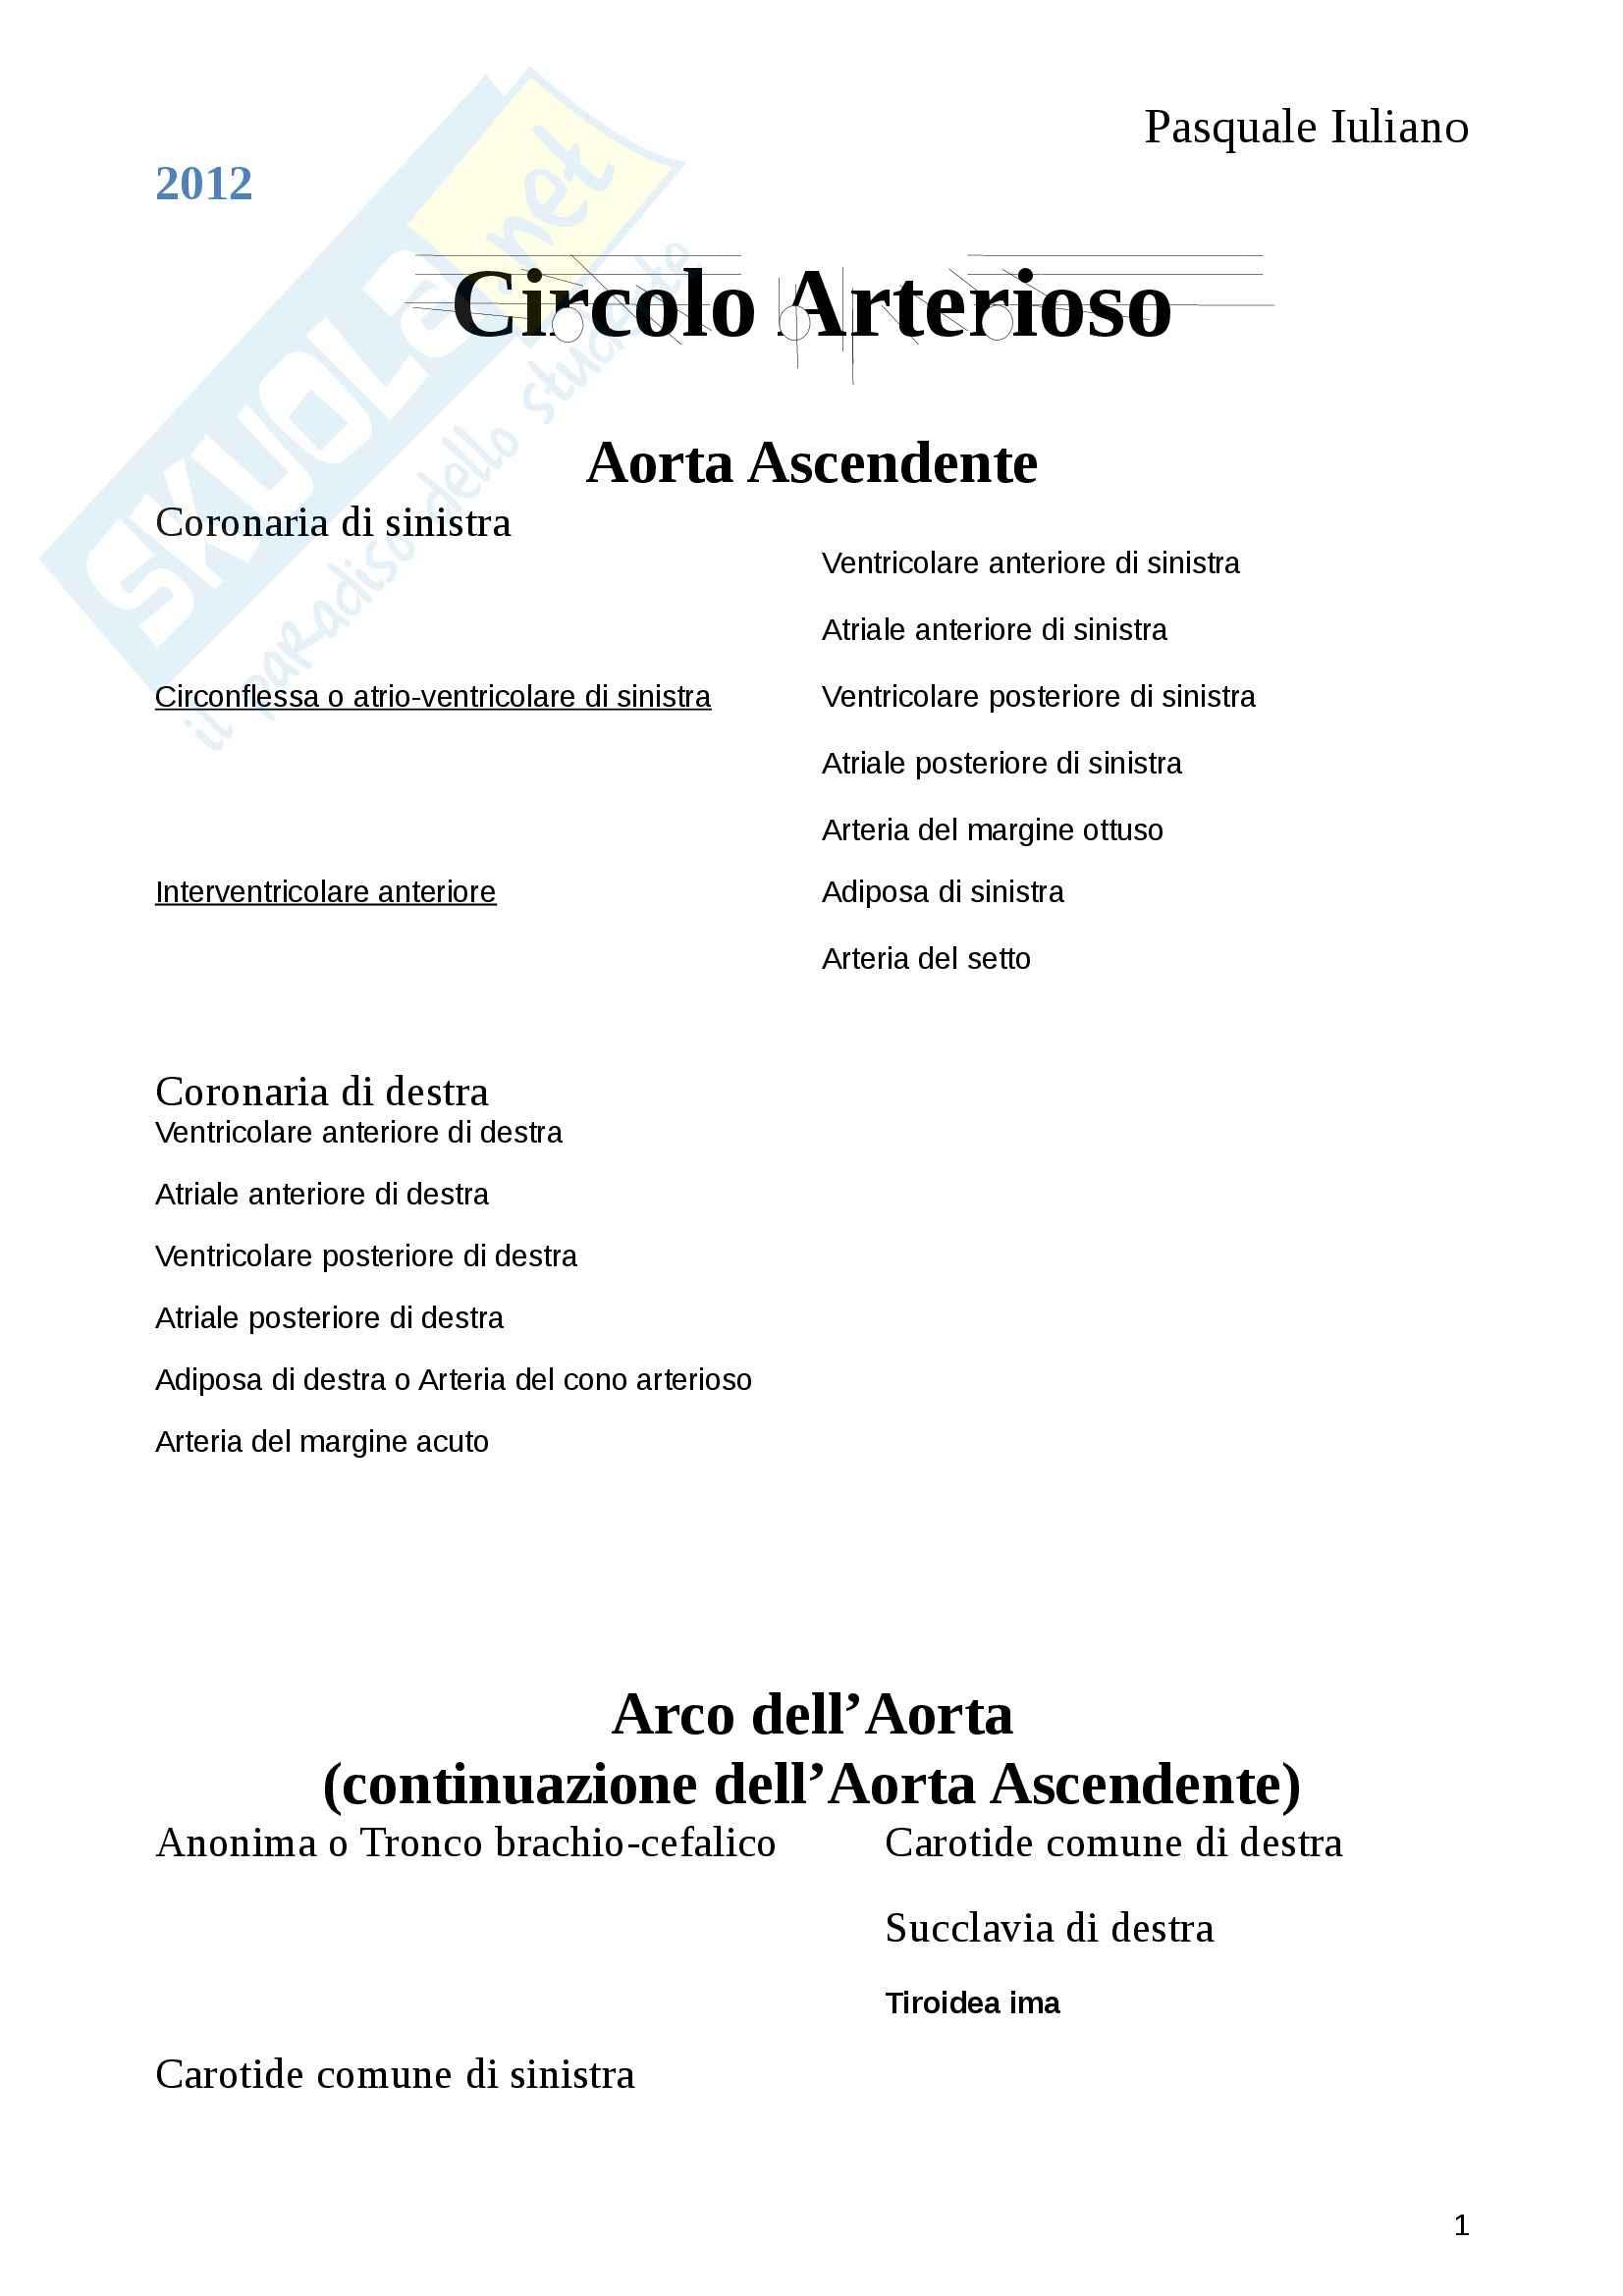 Anatomia umana - sistema circolatorio arterioso